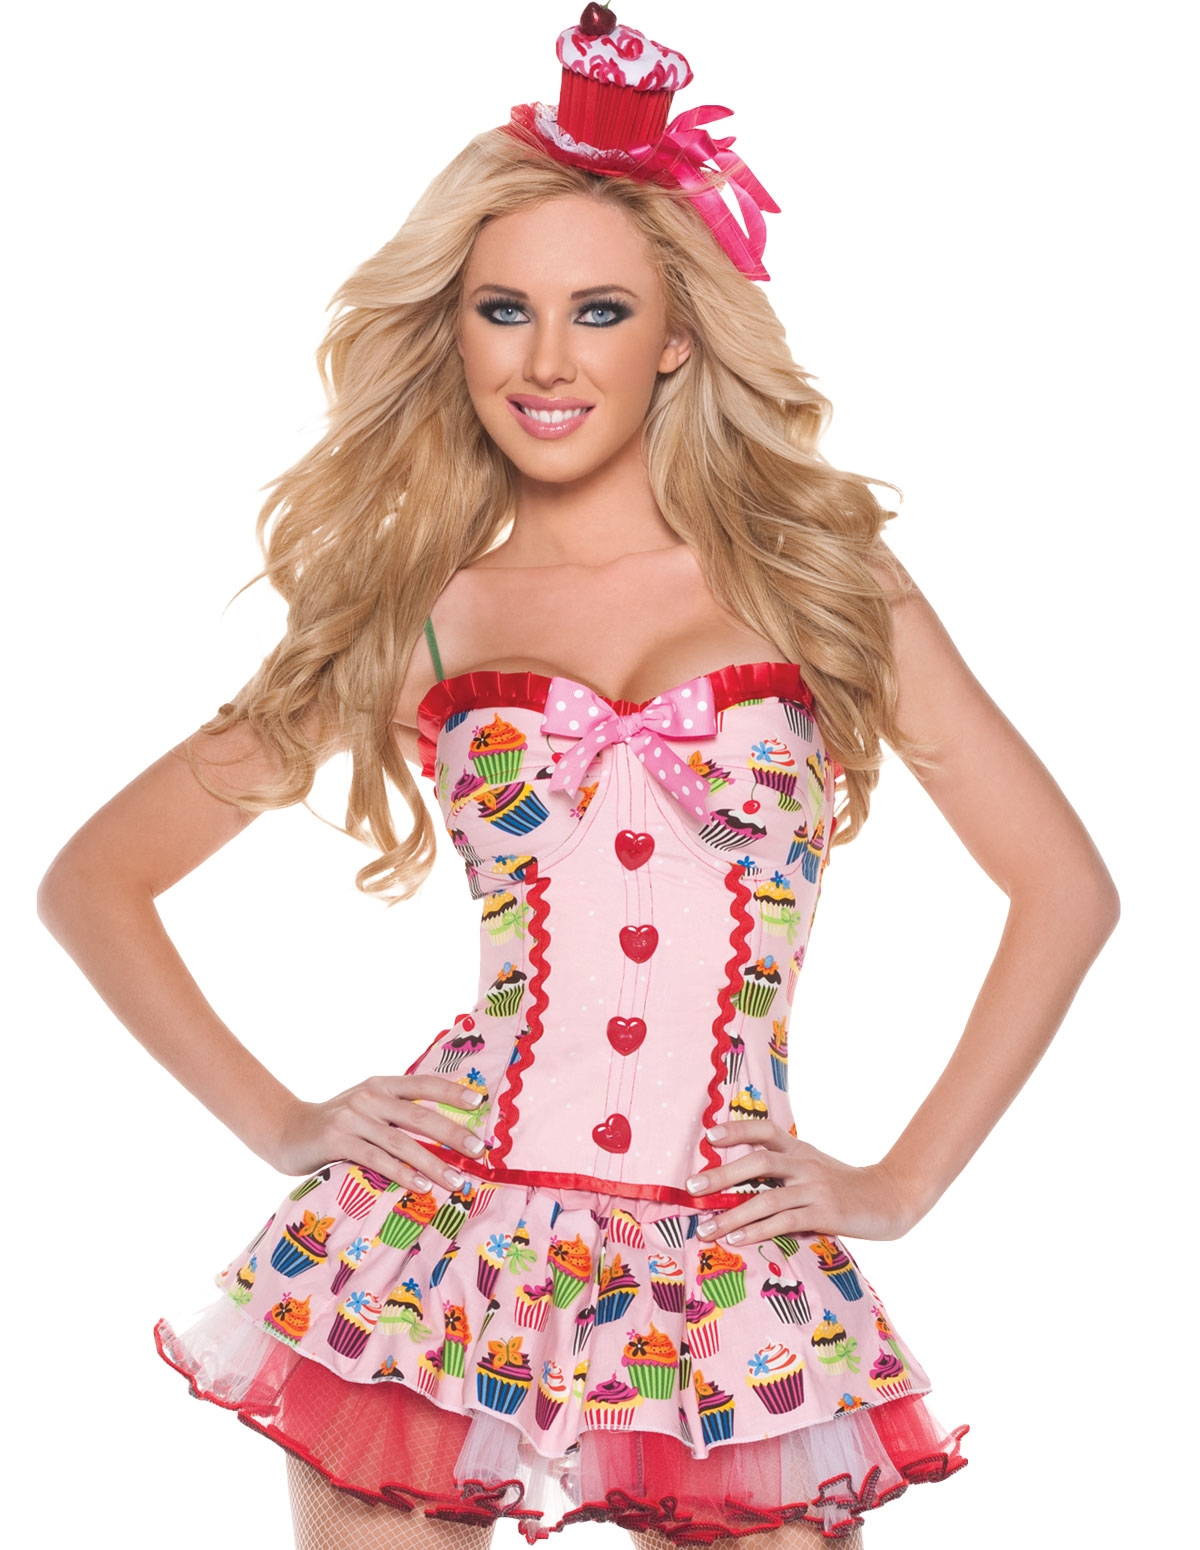 Cupcake Girl Costume